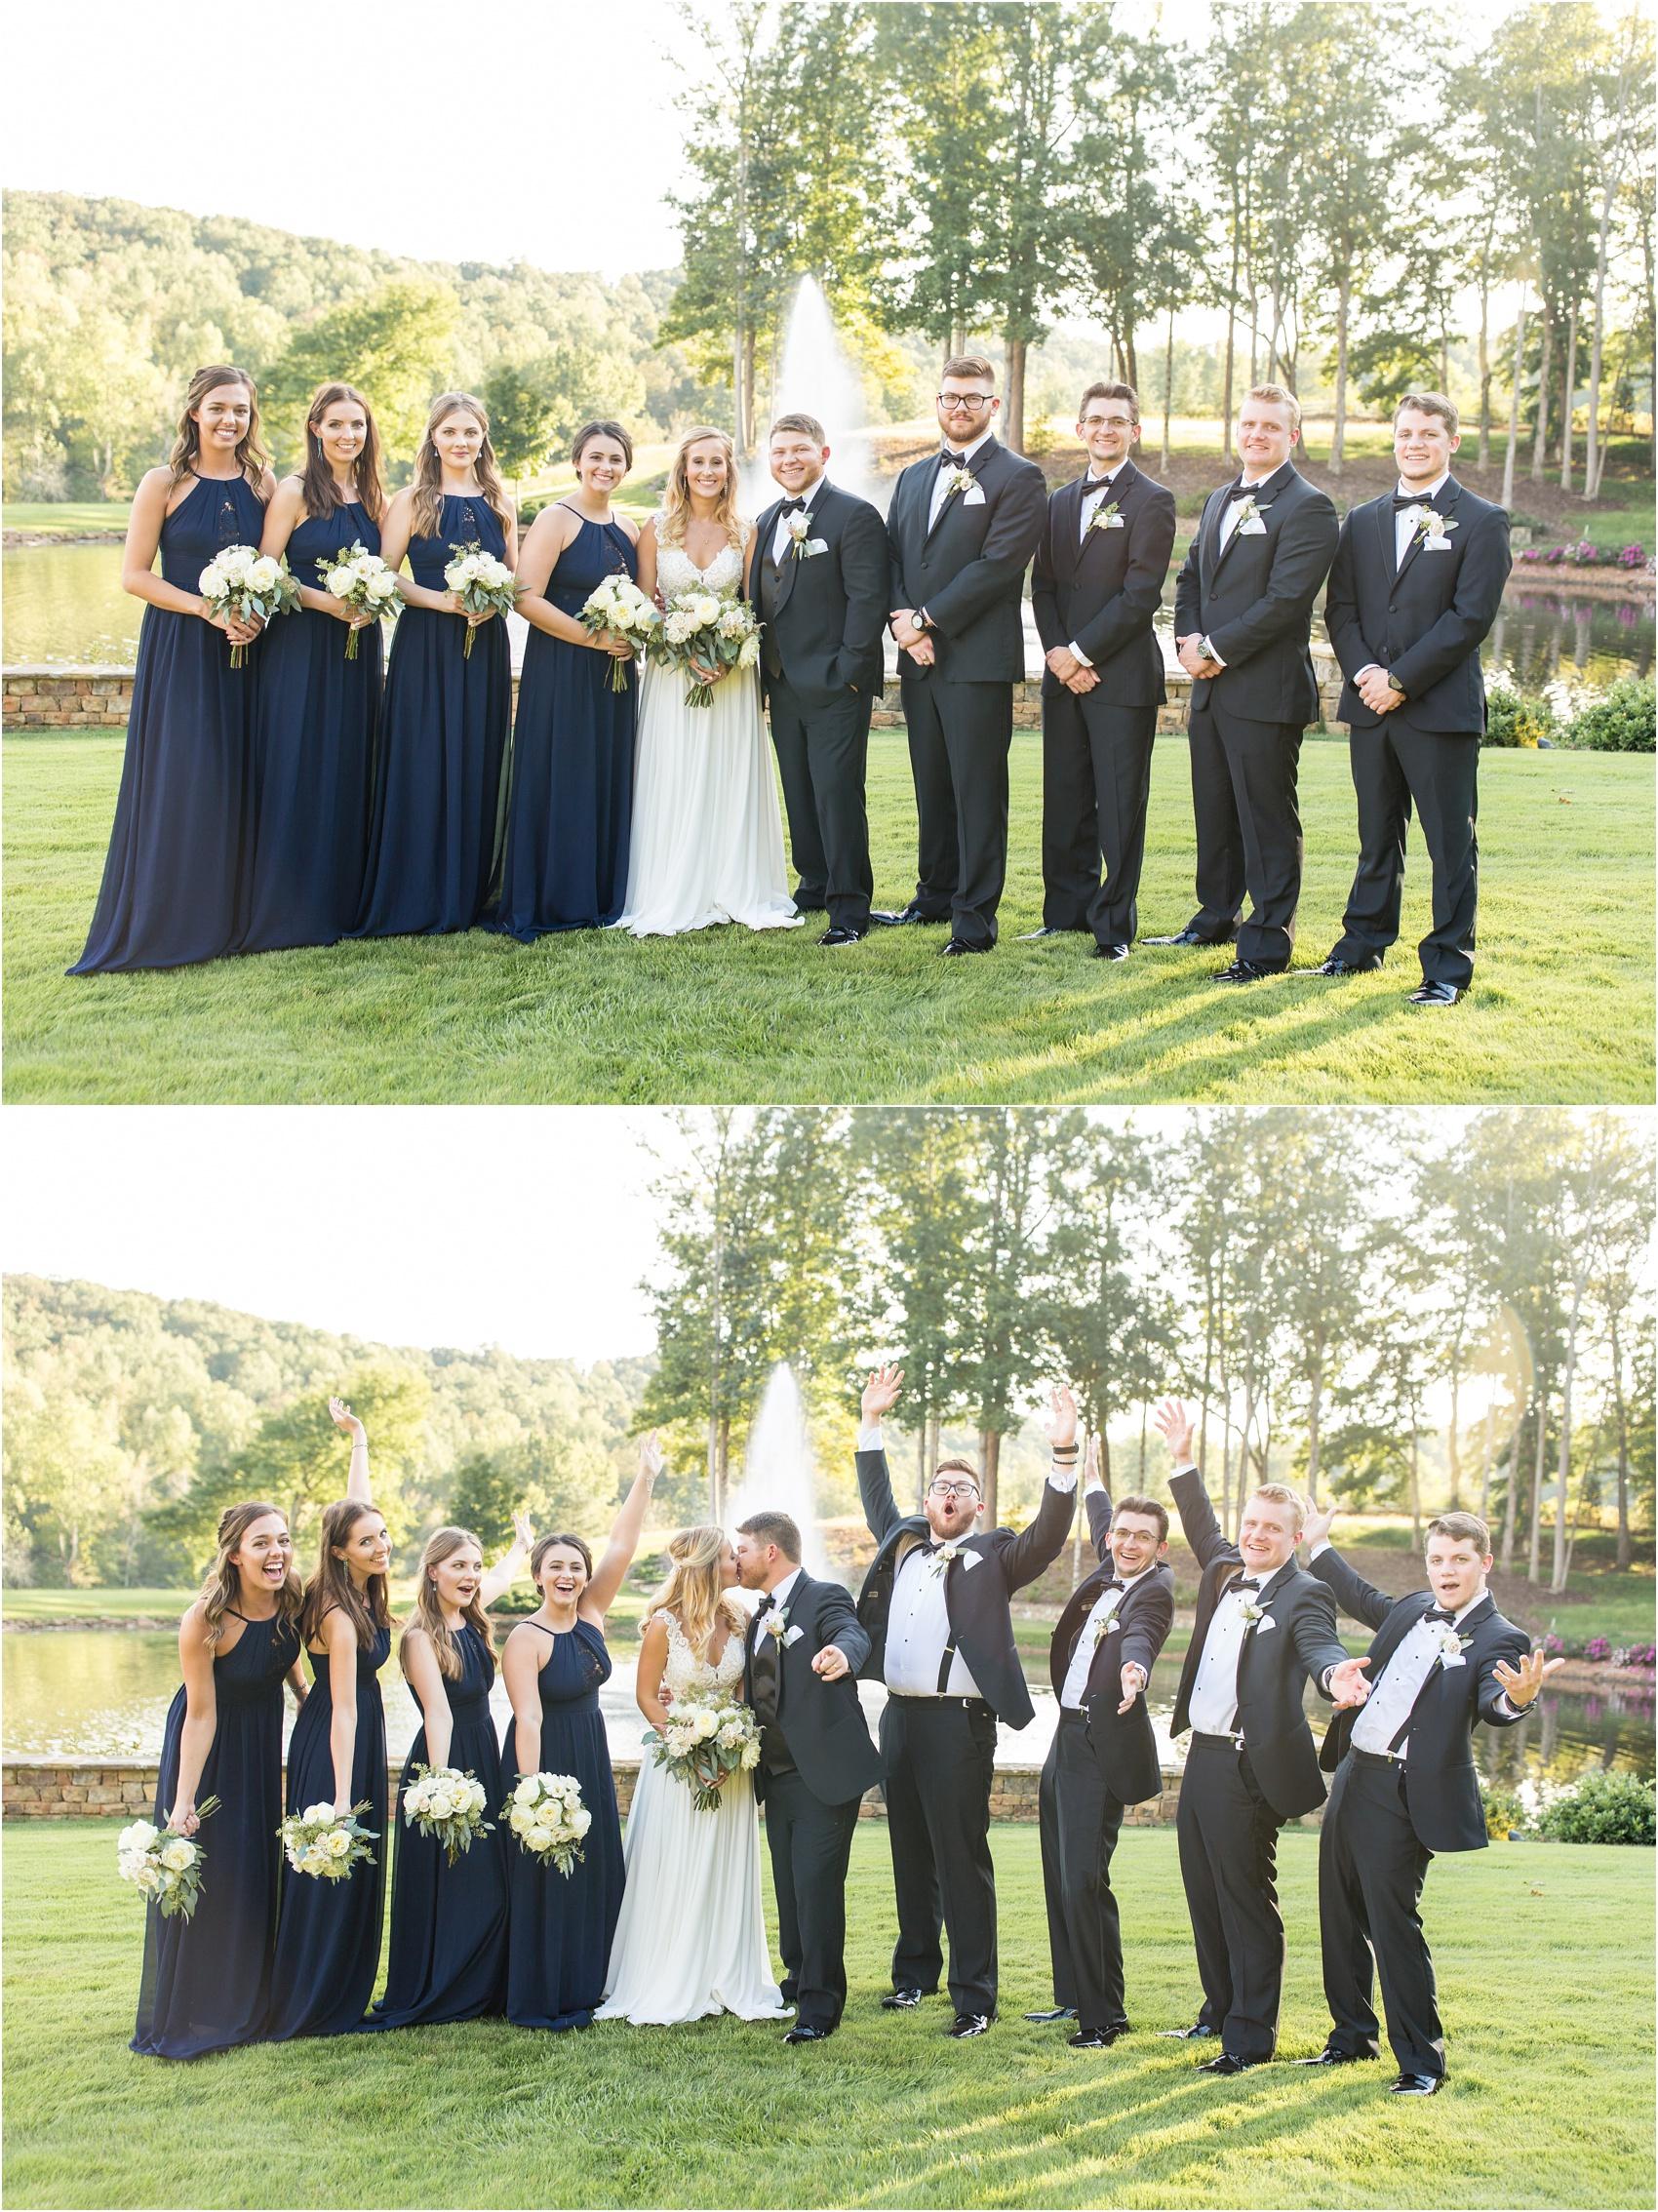 Savannah Eve Photography- Jurek-Woodworth Wedding- Sneak Peek-52.jpg